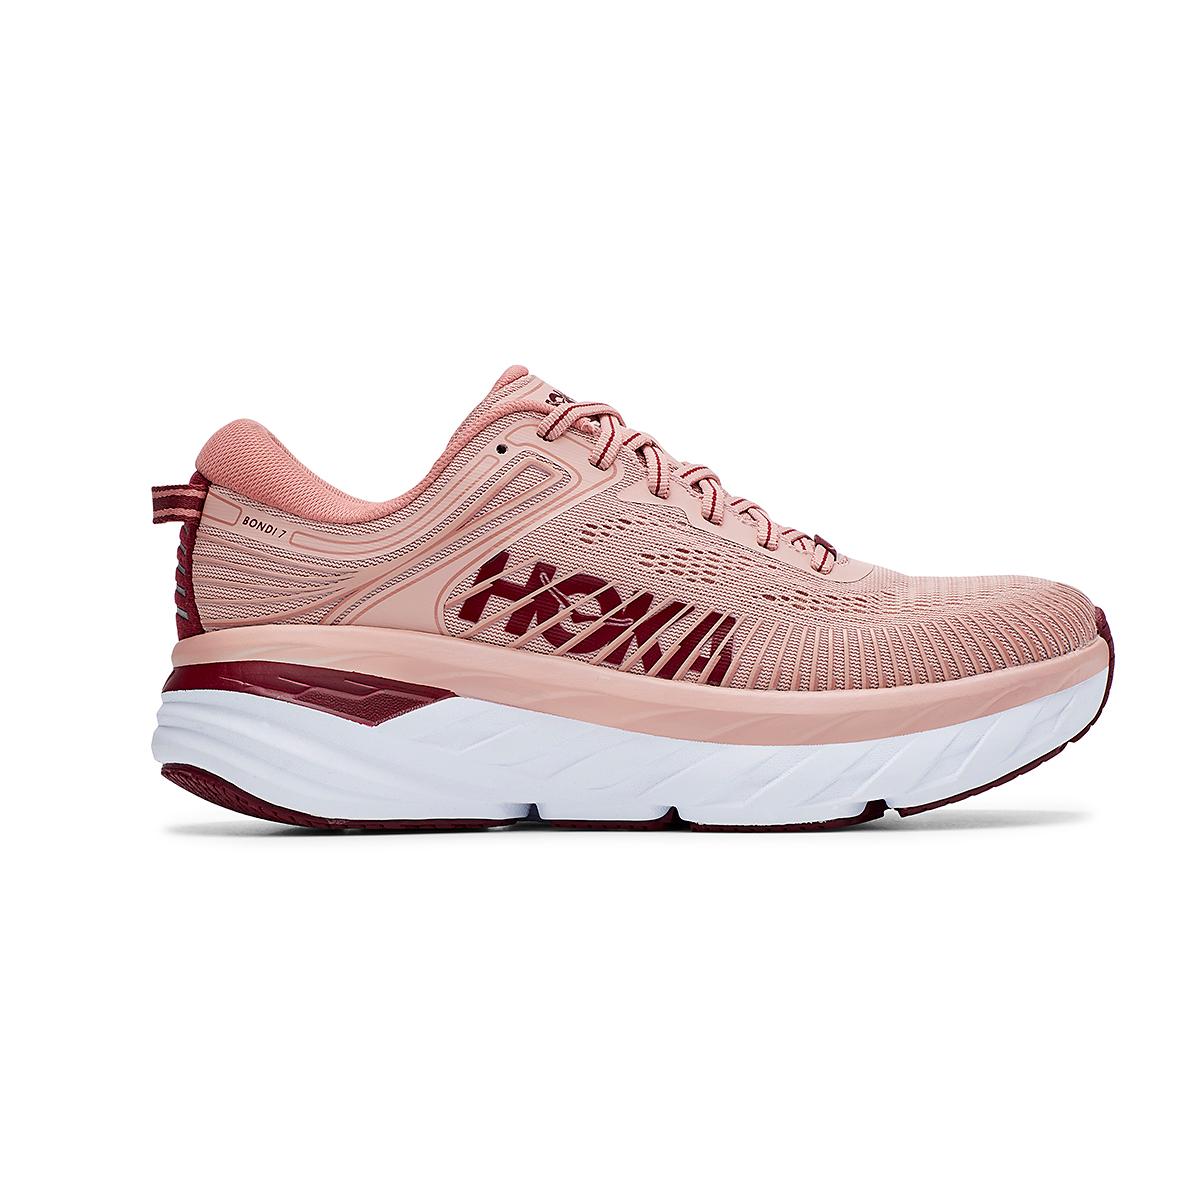 Women's Hoka One One Bondi 7 Running Shoe - Color: Misty Rose/Cordovan - Size: 5 - Width: Regular, Misty Rose/Cordovan, large, image 1